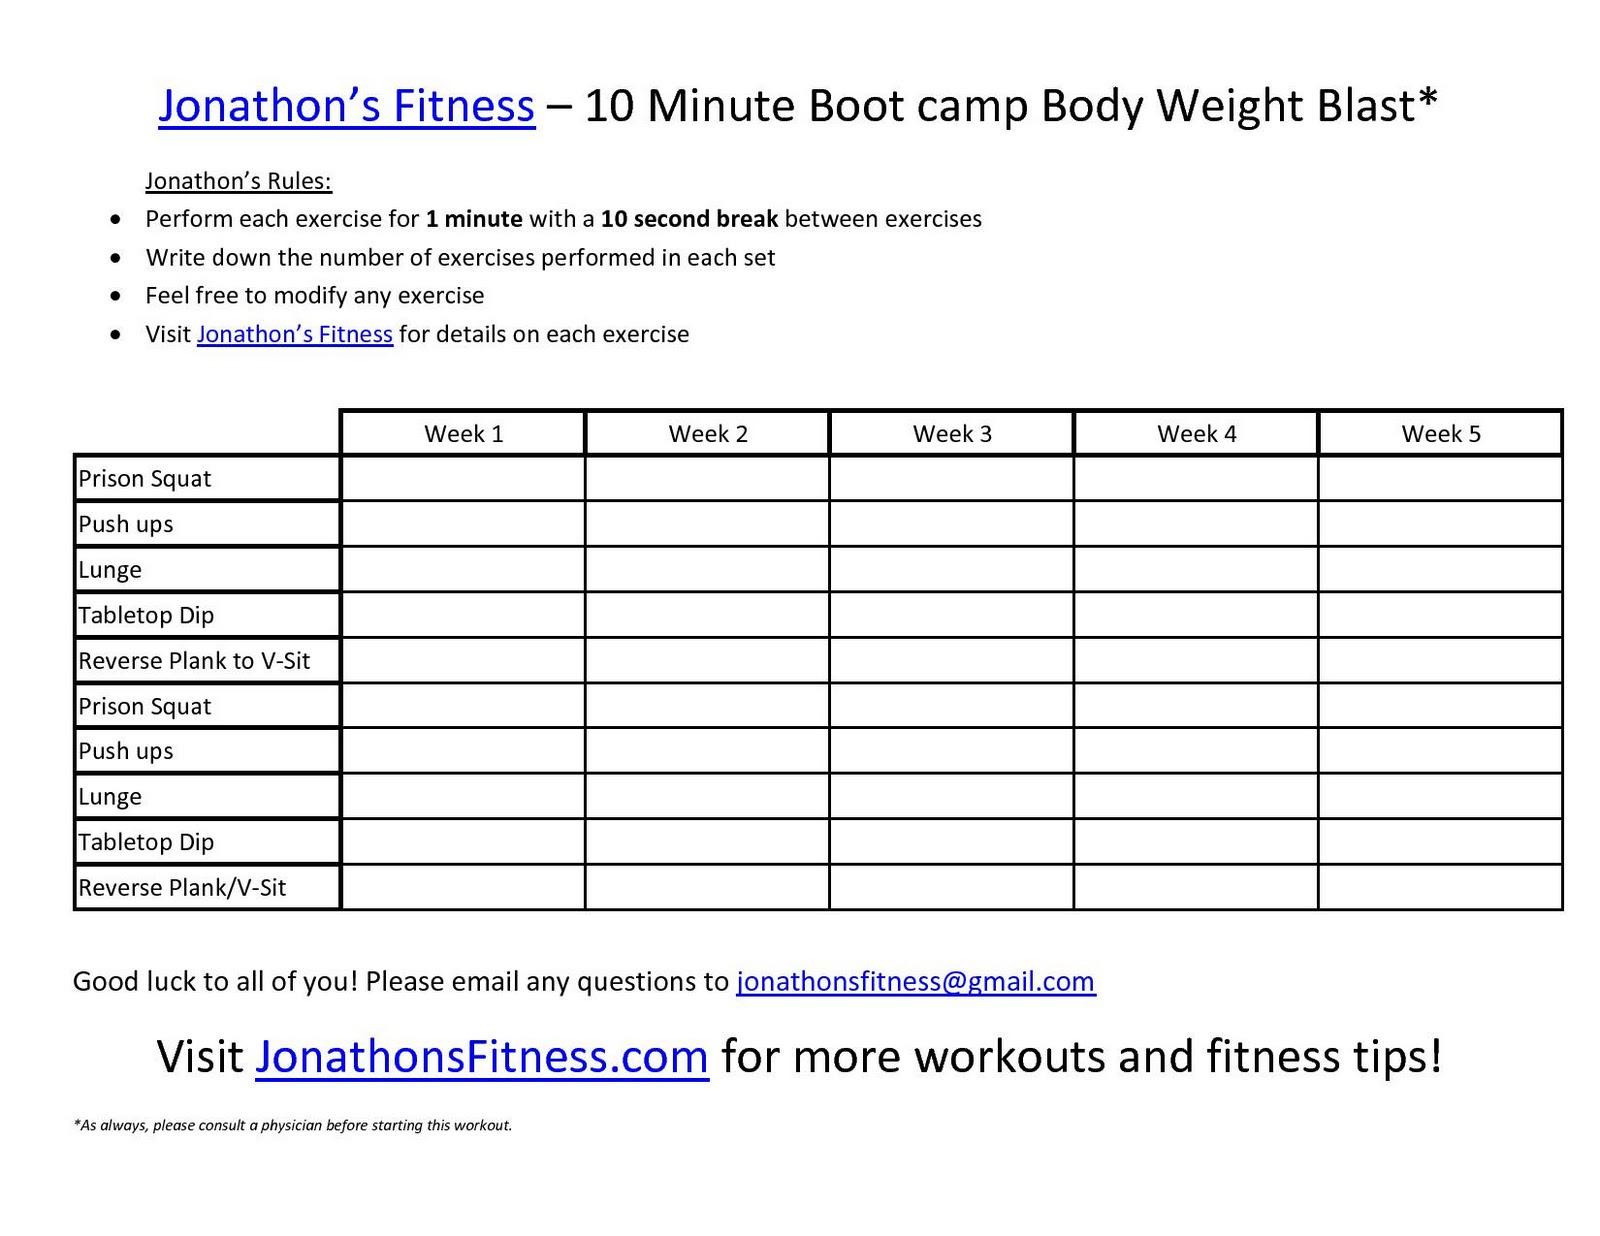 Jonathon's Fitness Site: Printable Workout Routine - Free Printable Gym Workout Routines